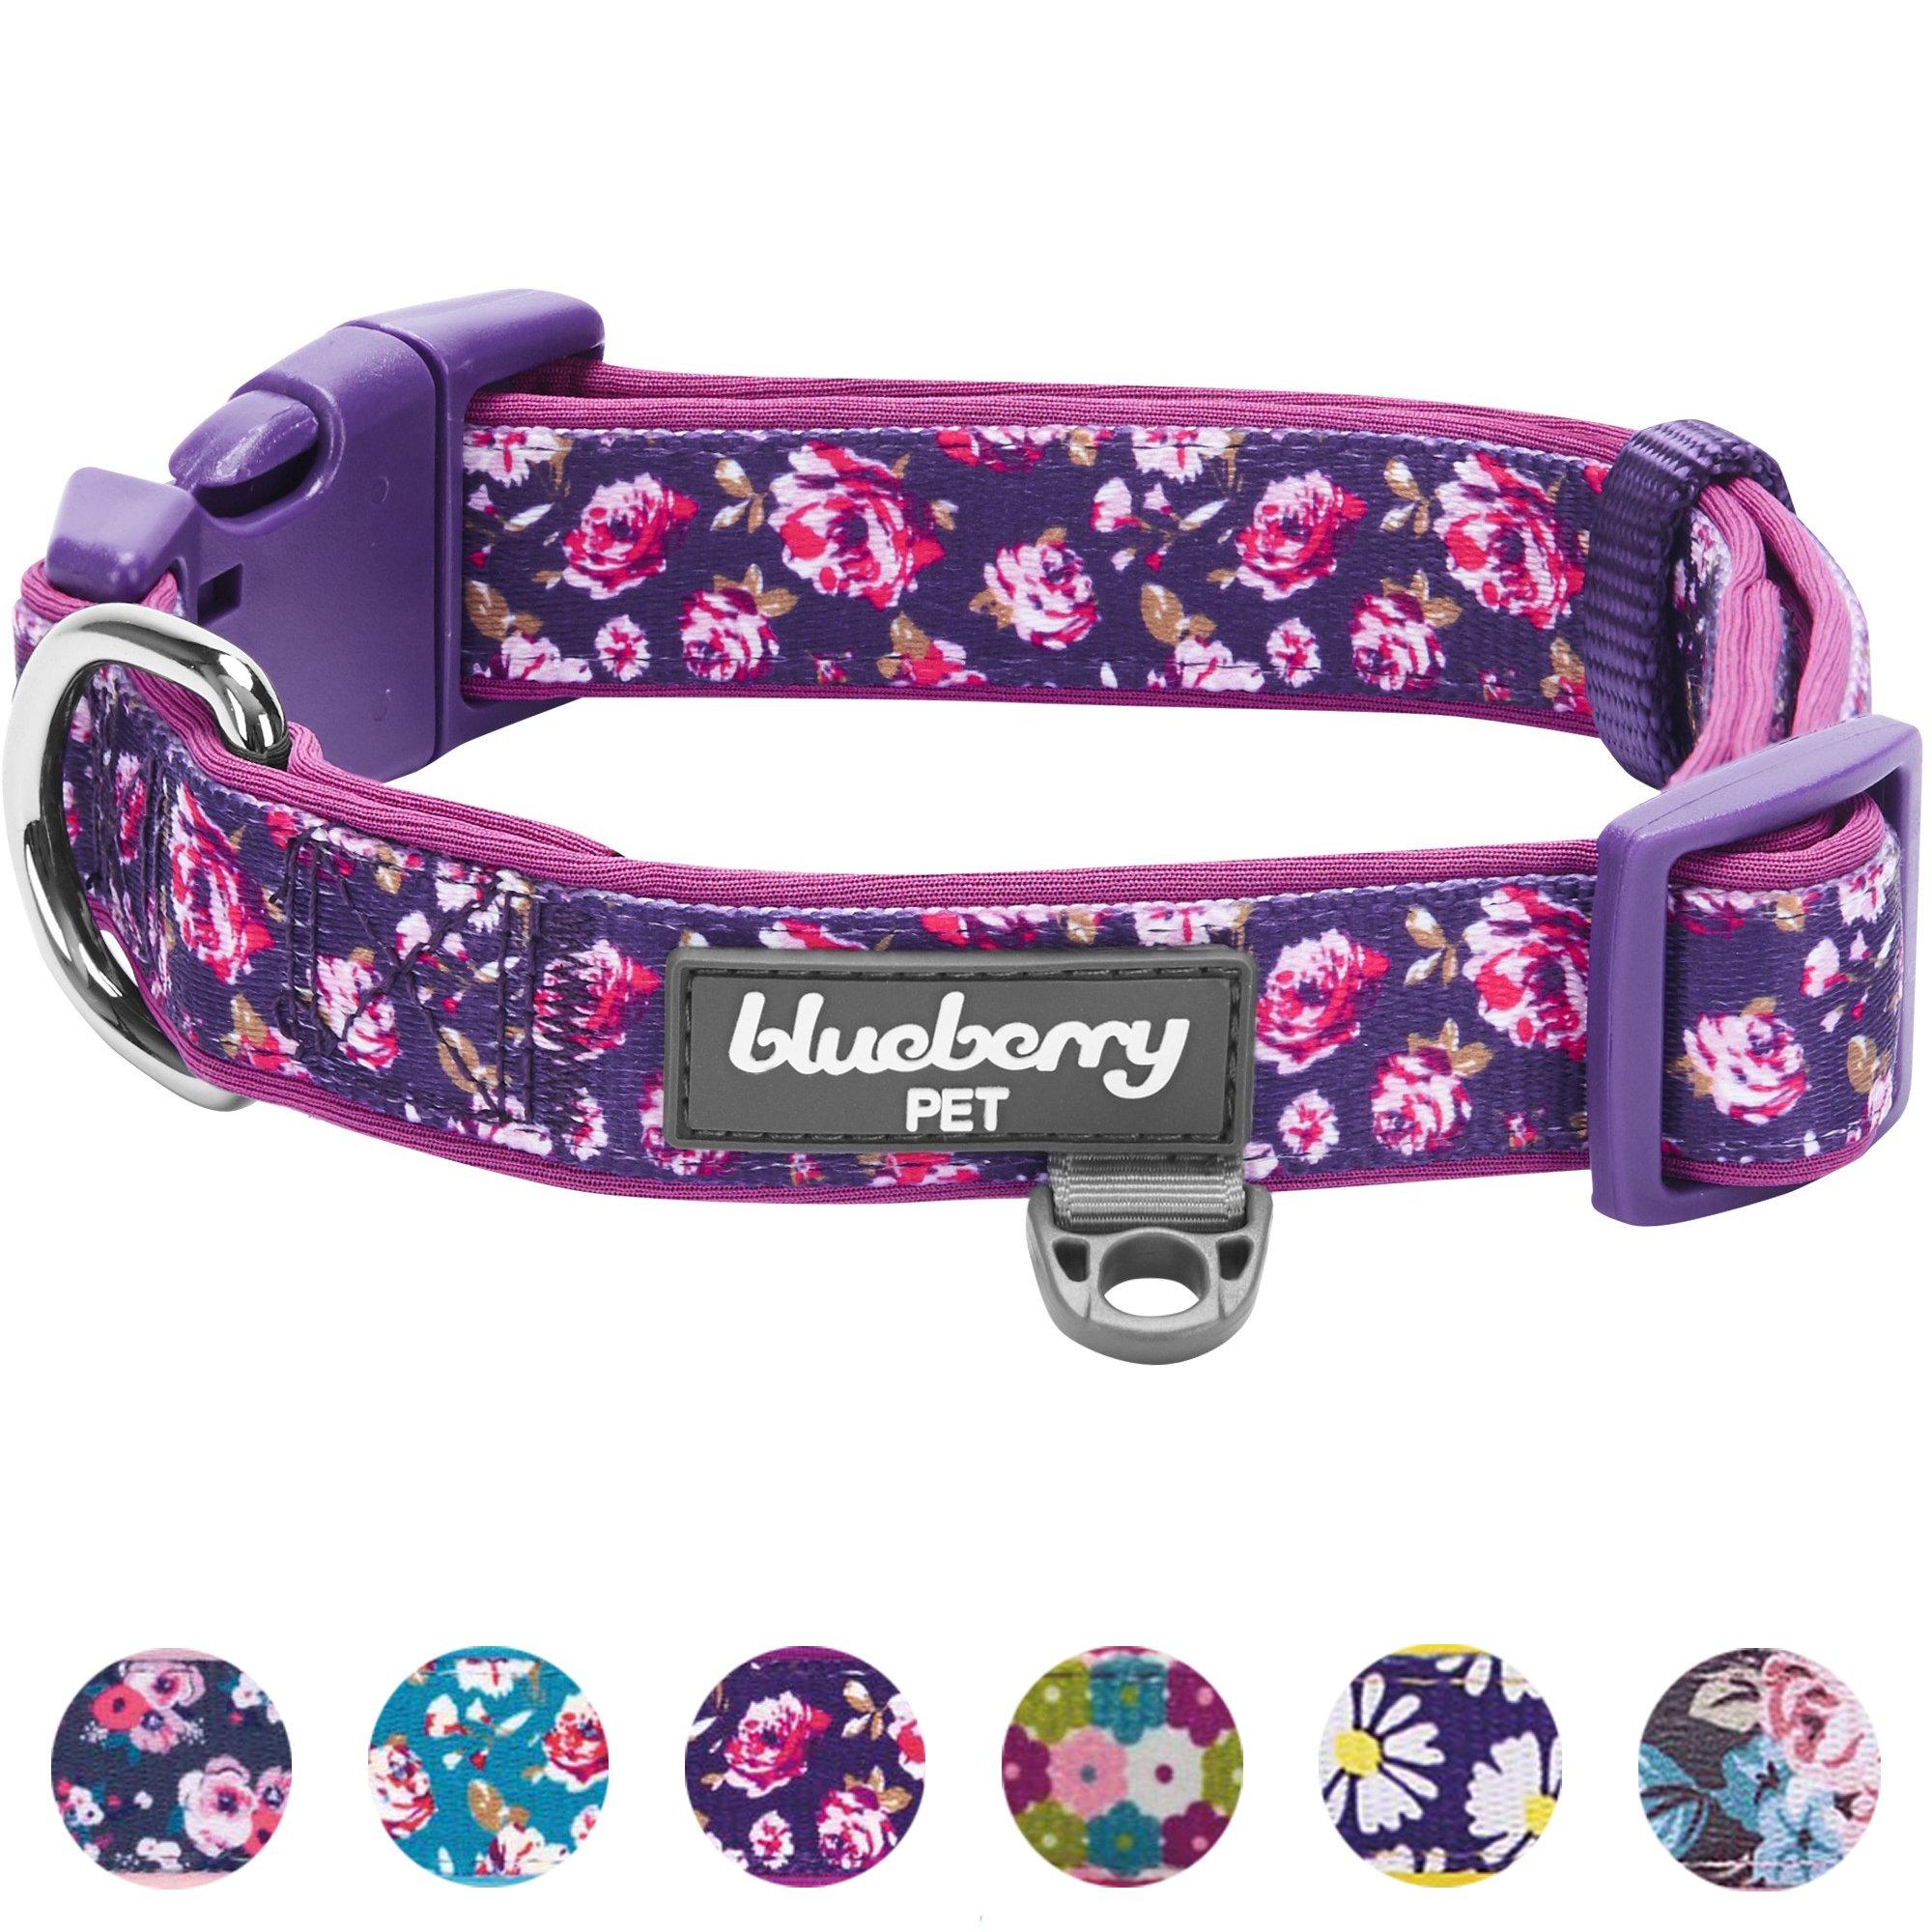 Blueberry Pet 6 Patterns Soft & Comfy Rose Print Plum Purple Padded Dog Collar, Large, Neck 18''-26'', Adjustable Collars for Dogs